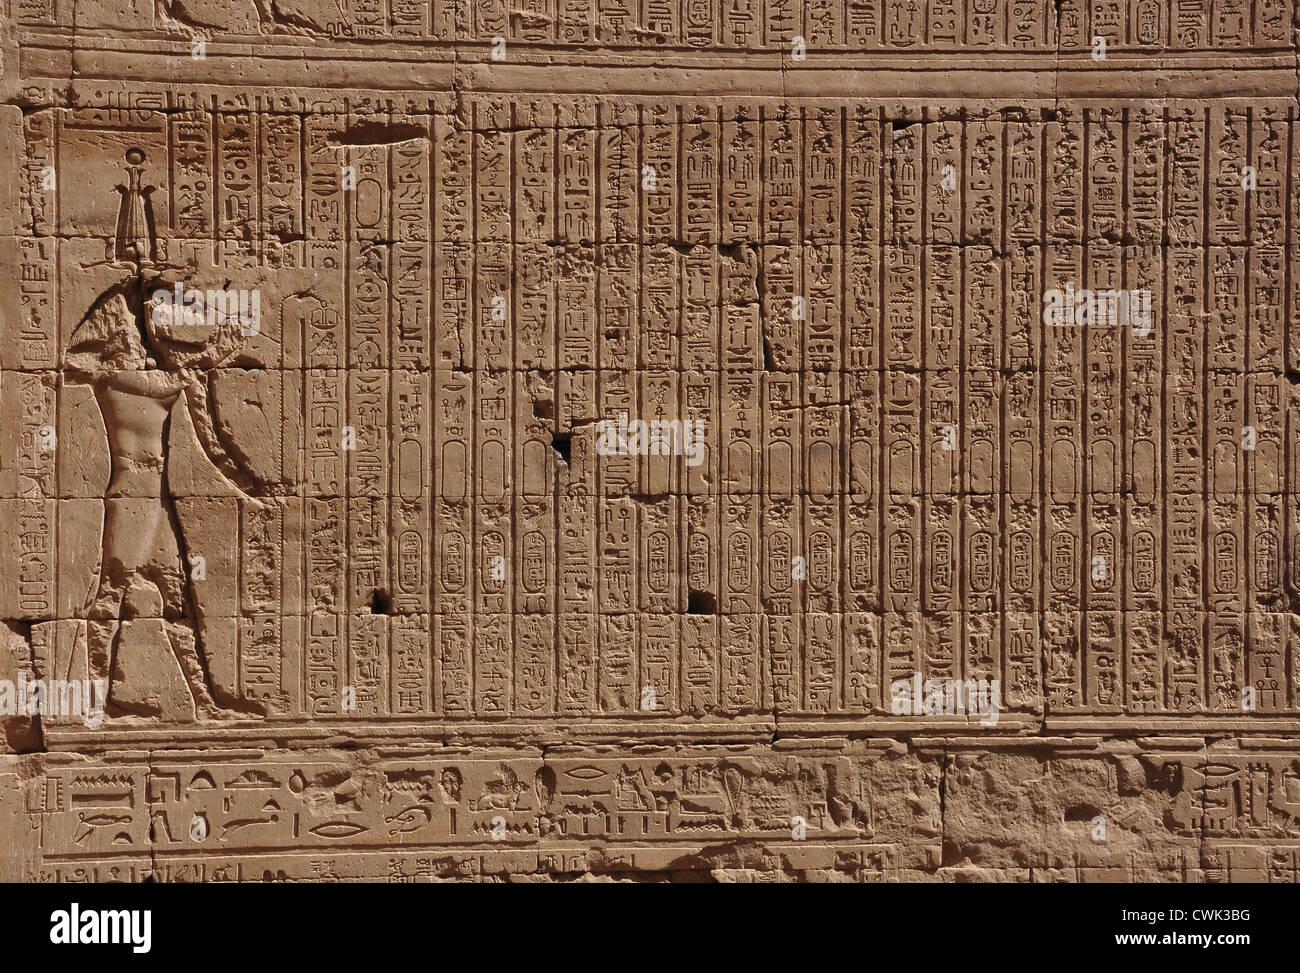 Egyptian Hieroglyph - Stock Image